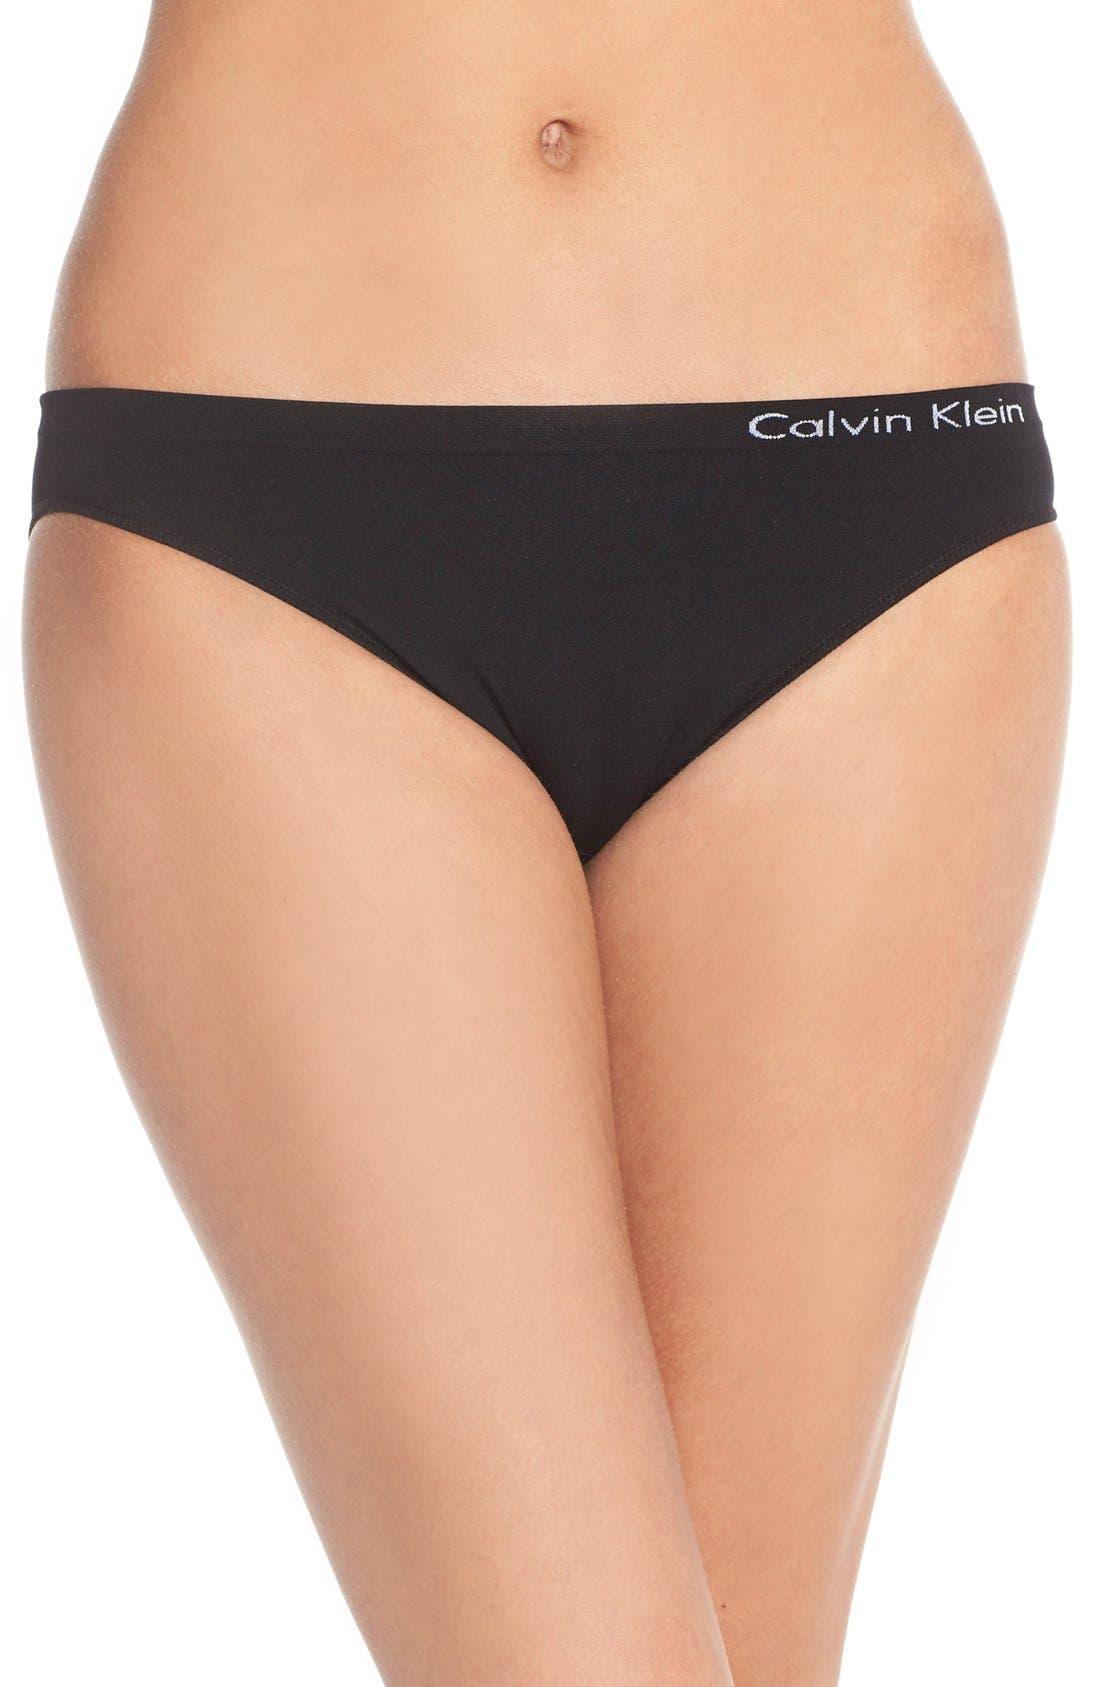 'Pure' Seamless Bikini,                         Main,                         color, BLACK